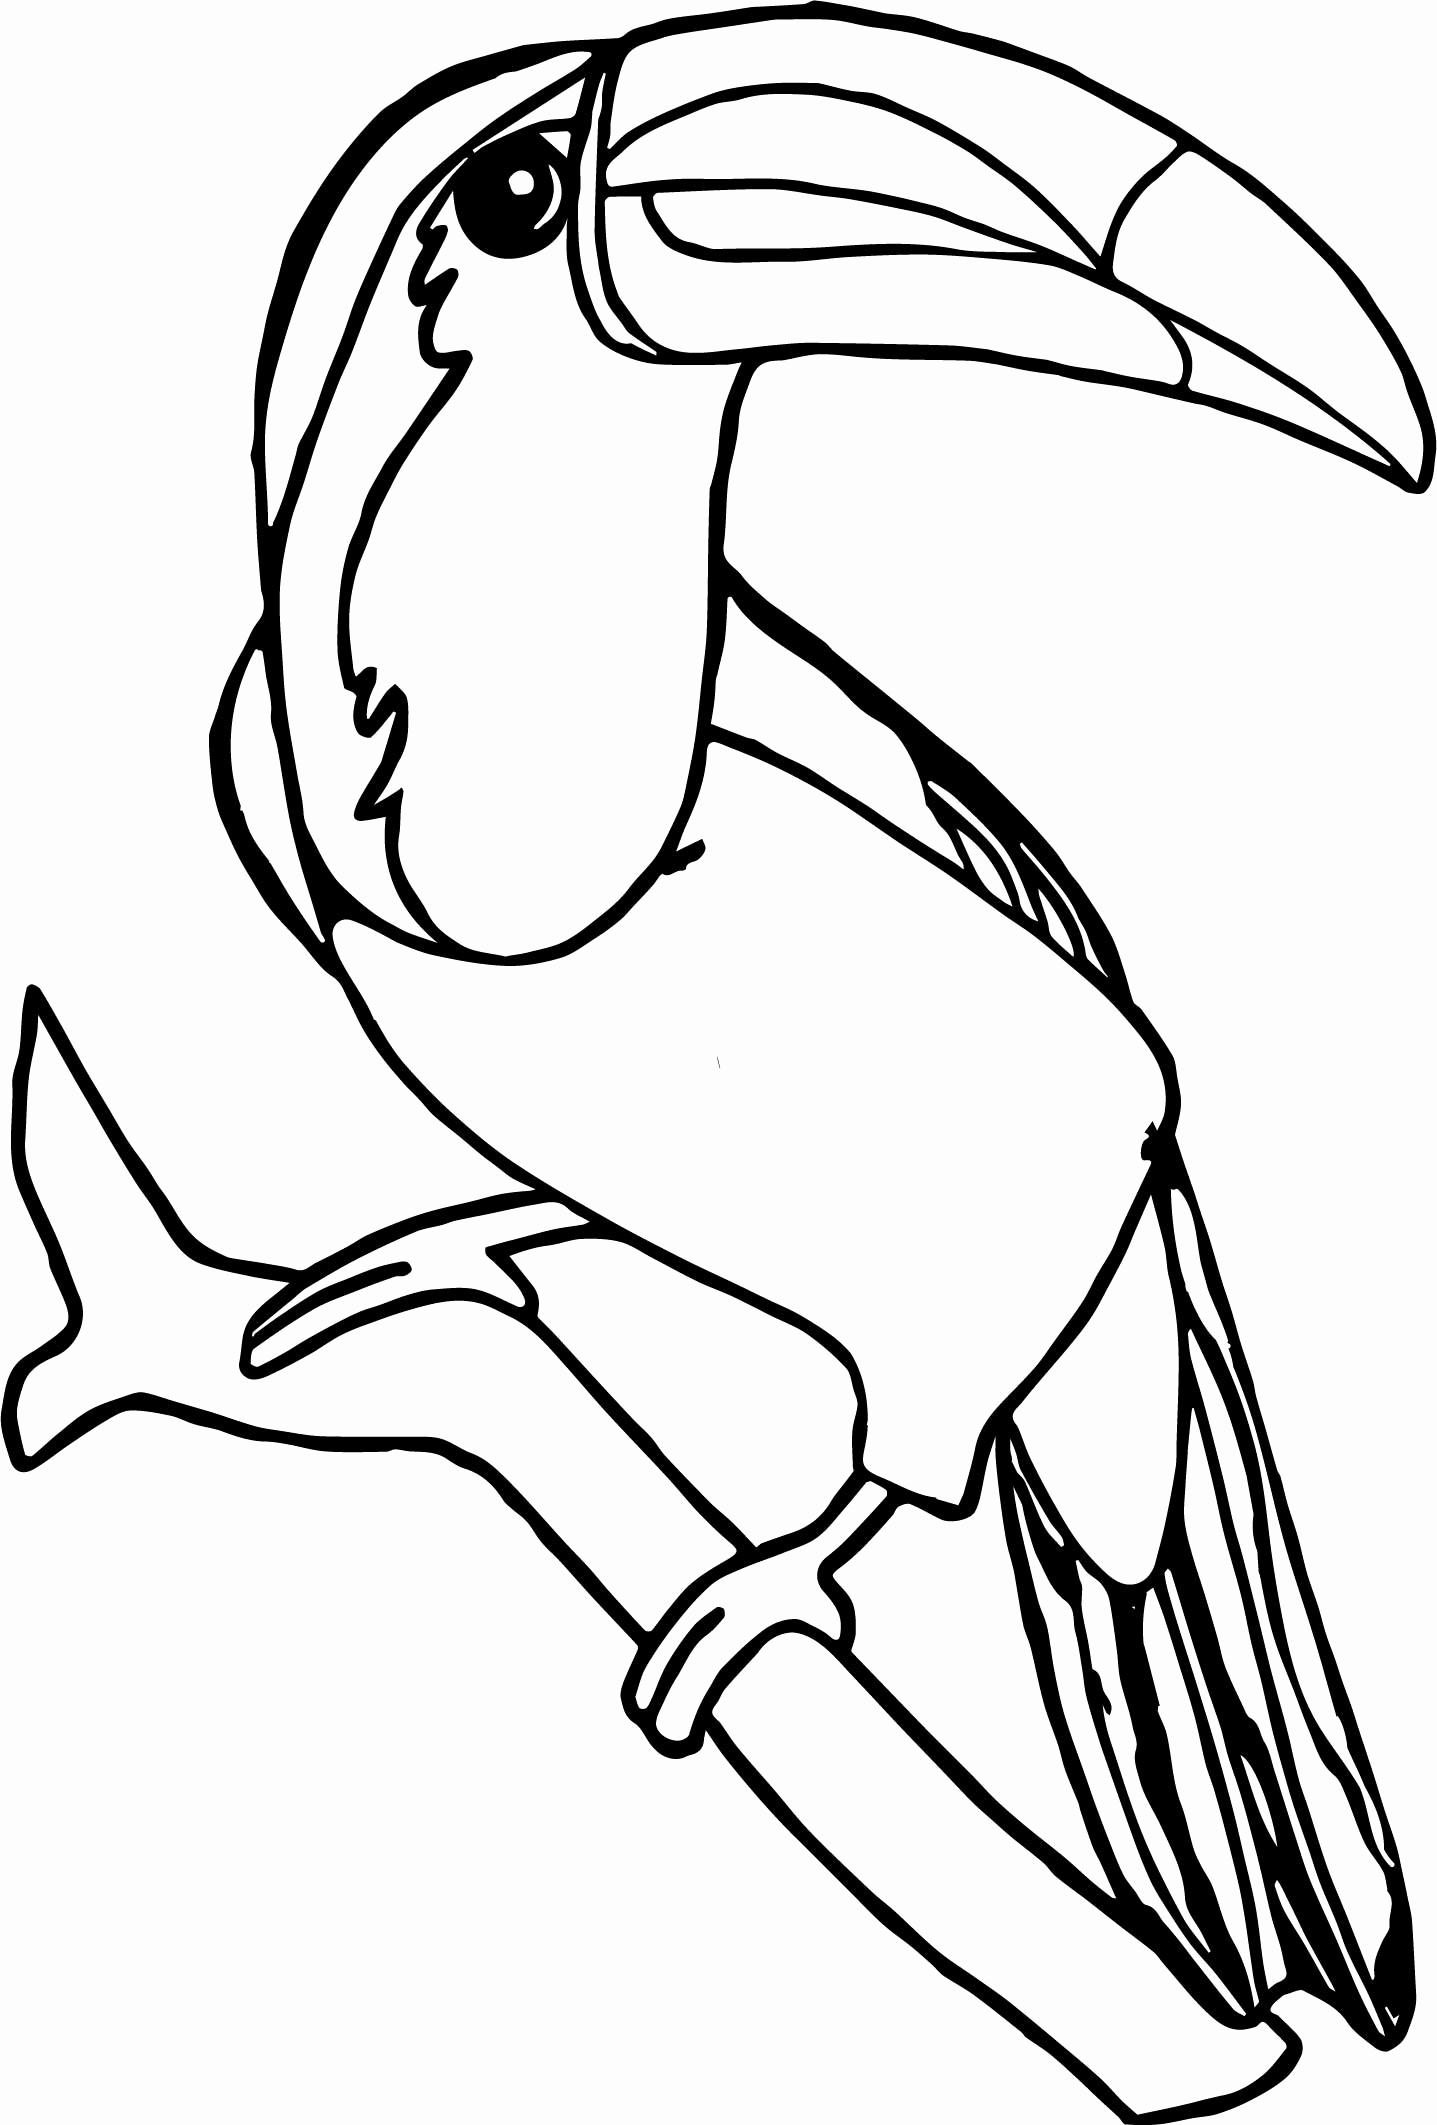 Toucans Drawing At Getdrawings